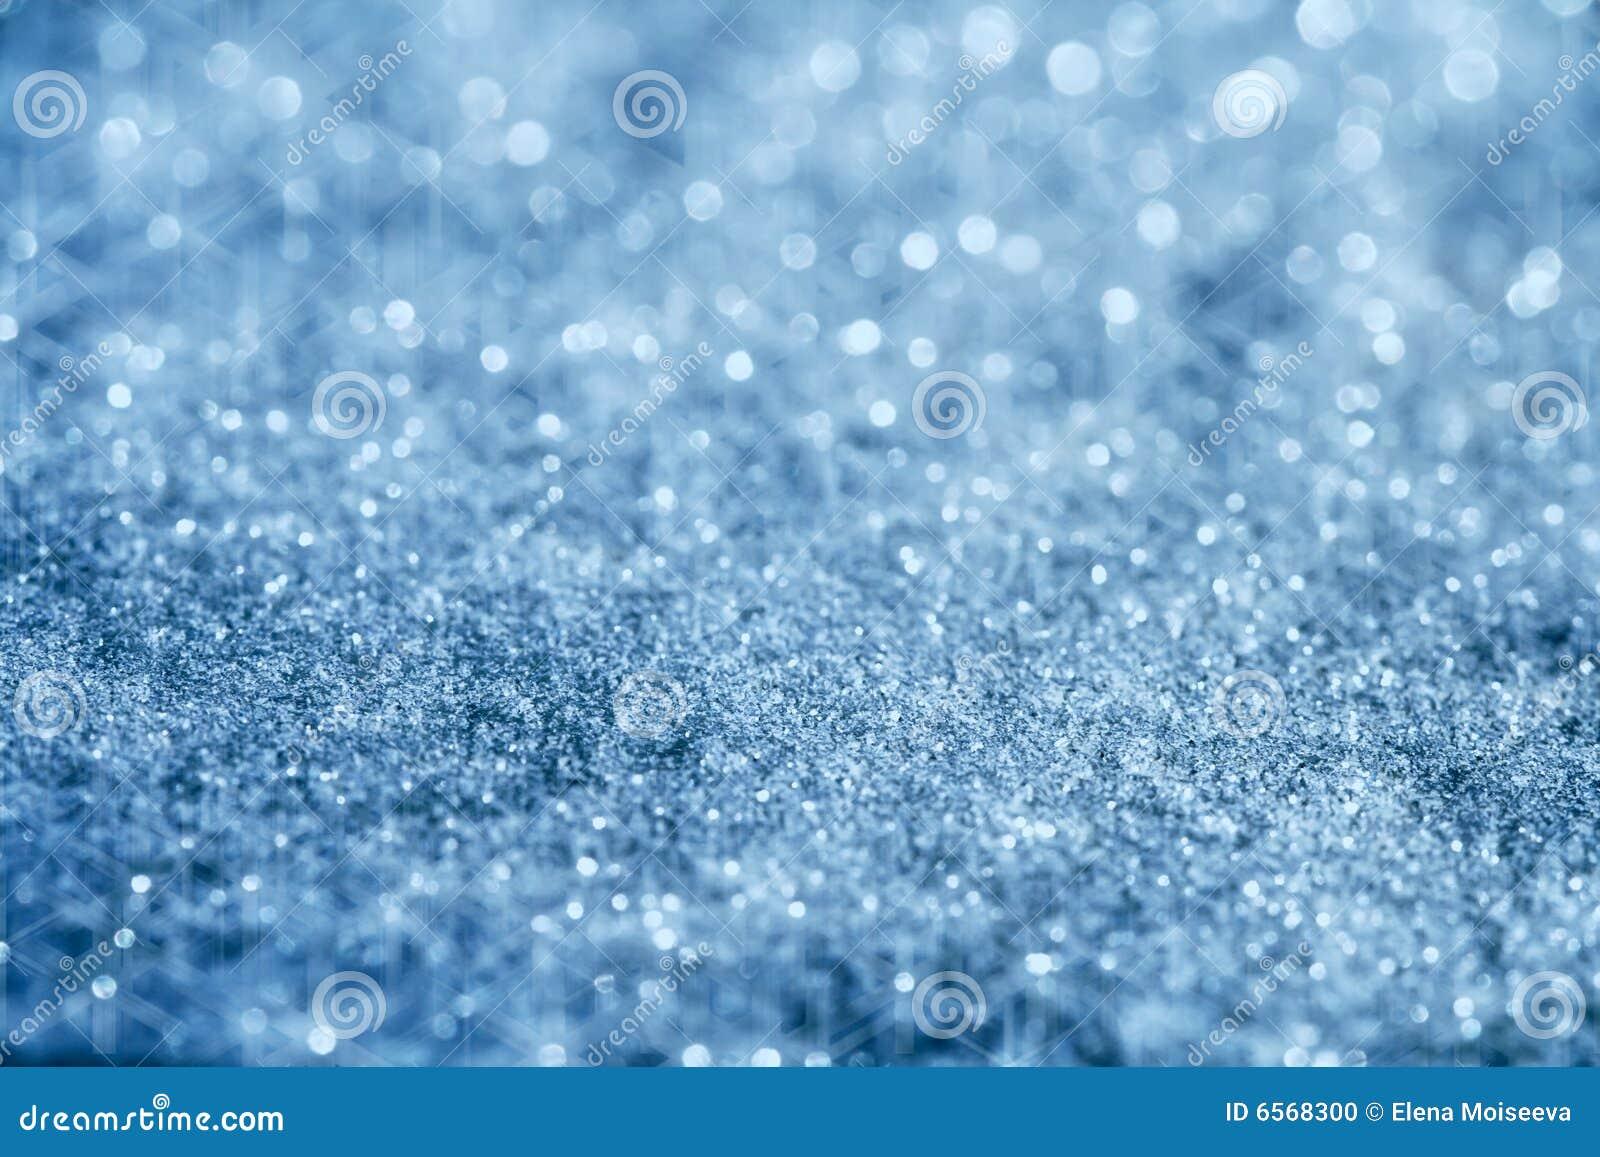 Blue Glitter Sparkles Background With Star Light Stock